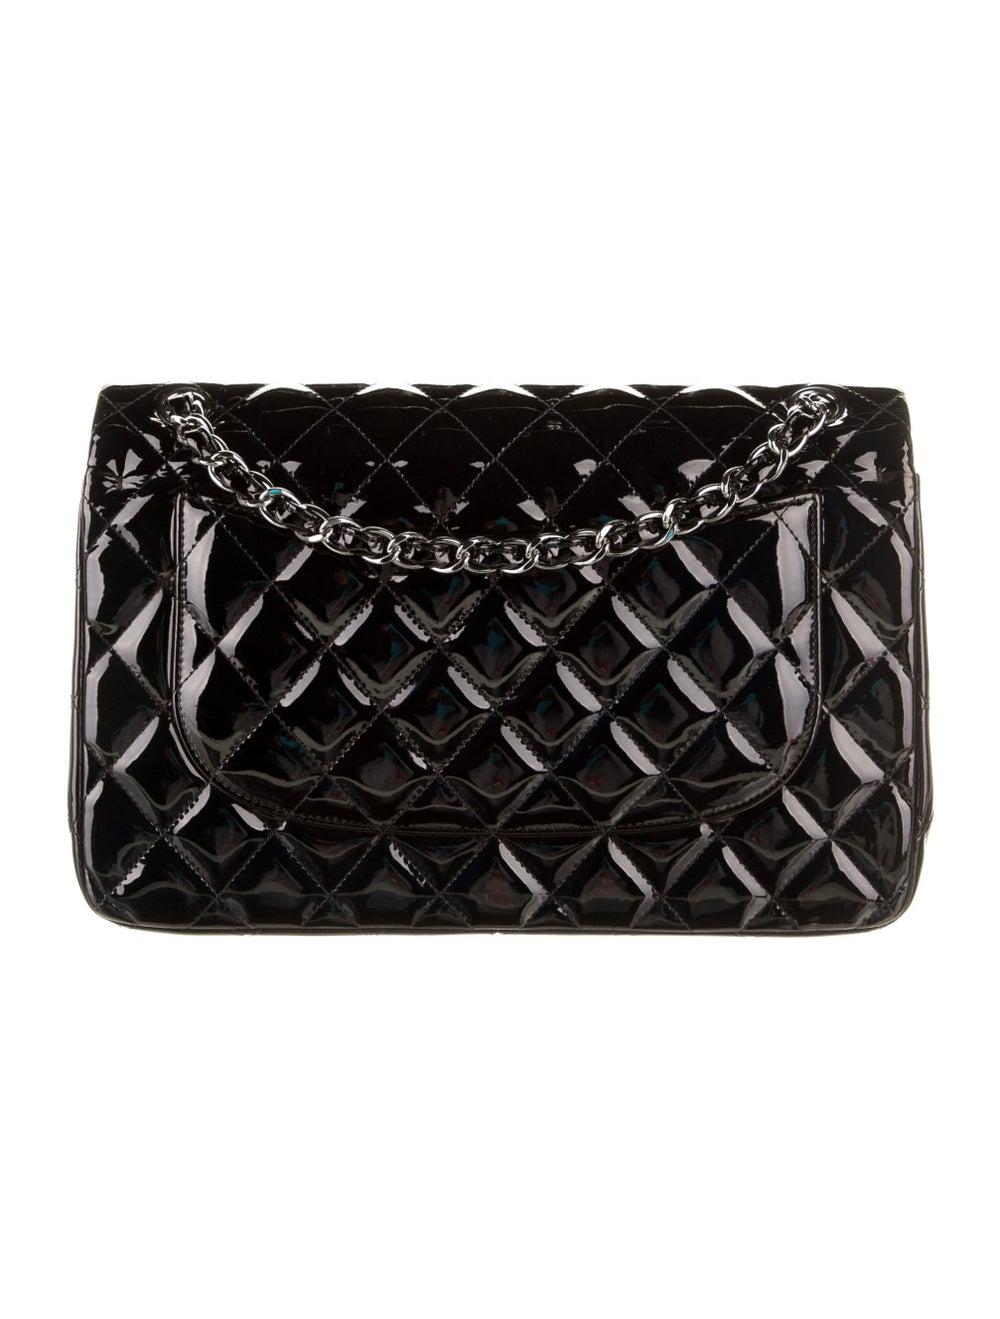 Chanel Classic Jumbo Patent Double Flap Bag Blue - image 4